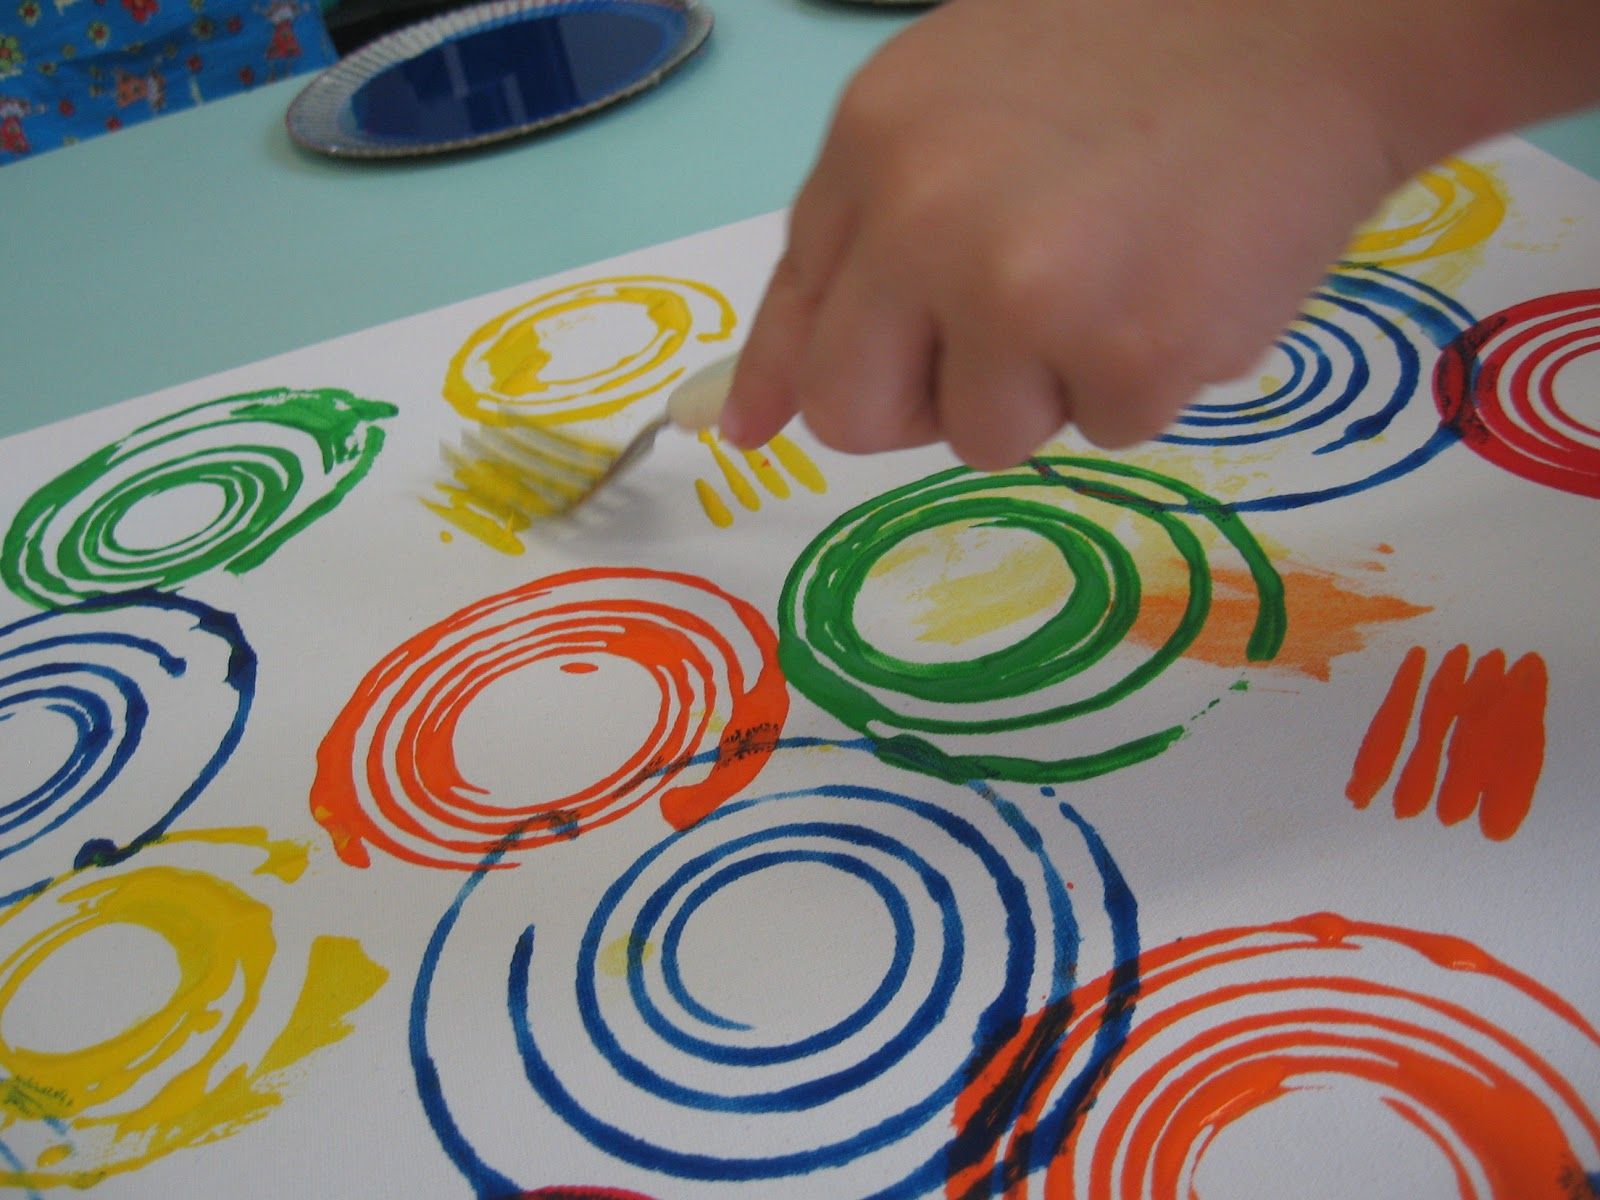 Famosos Ensinando Arte com Amor: Técnicas de pinturas ZB72